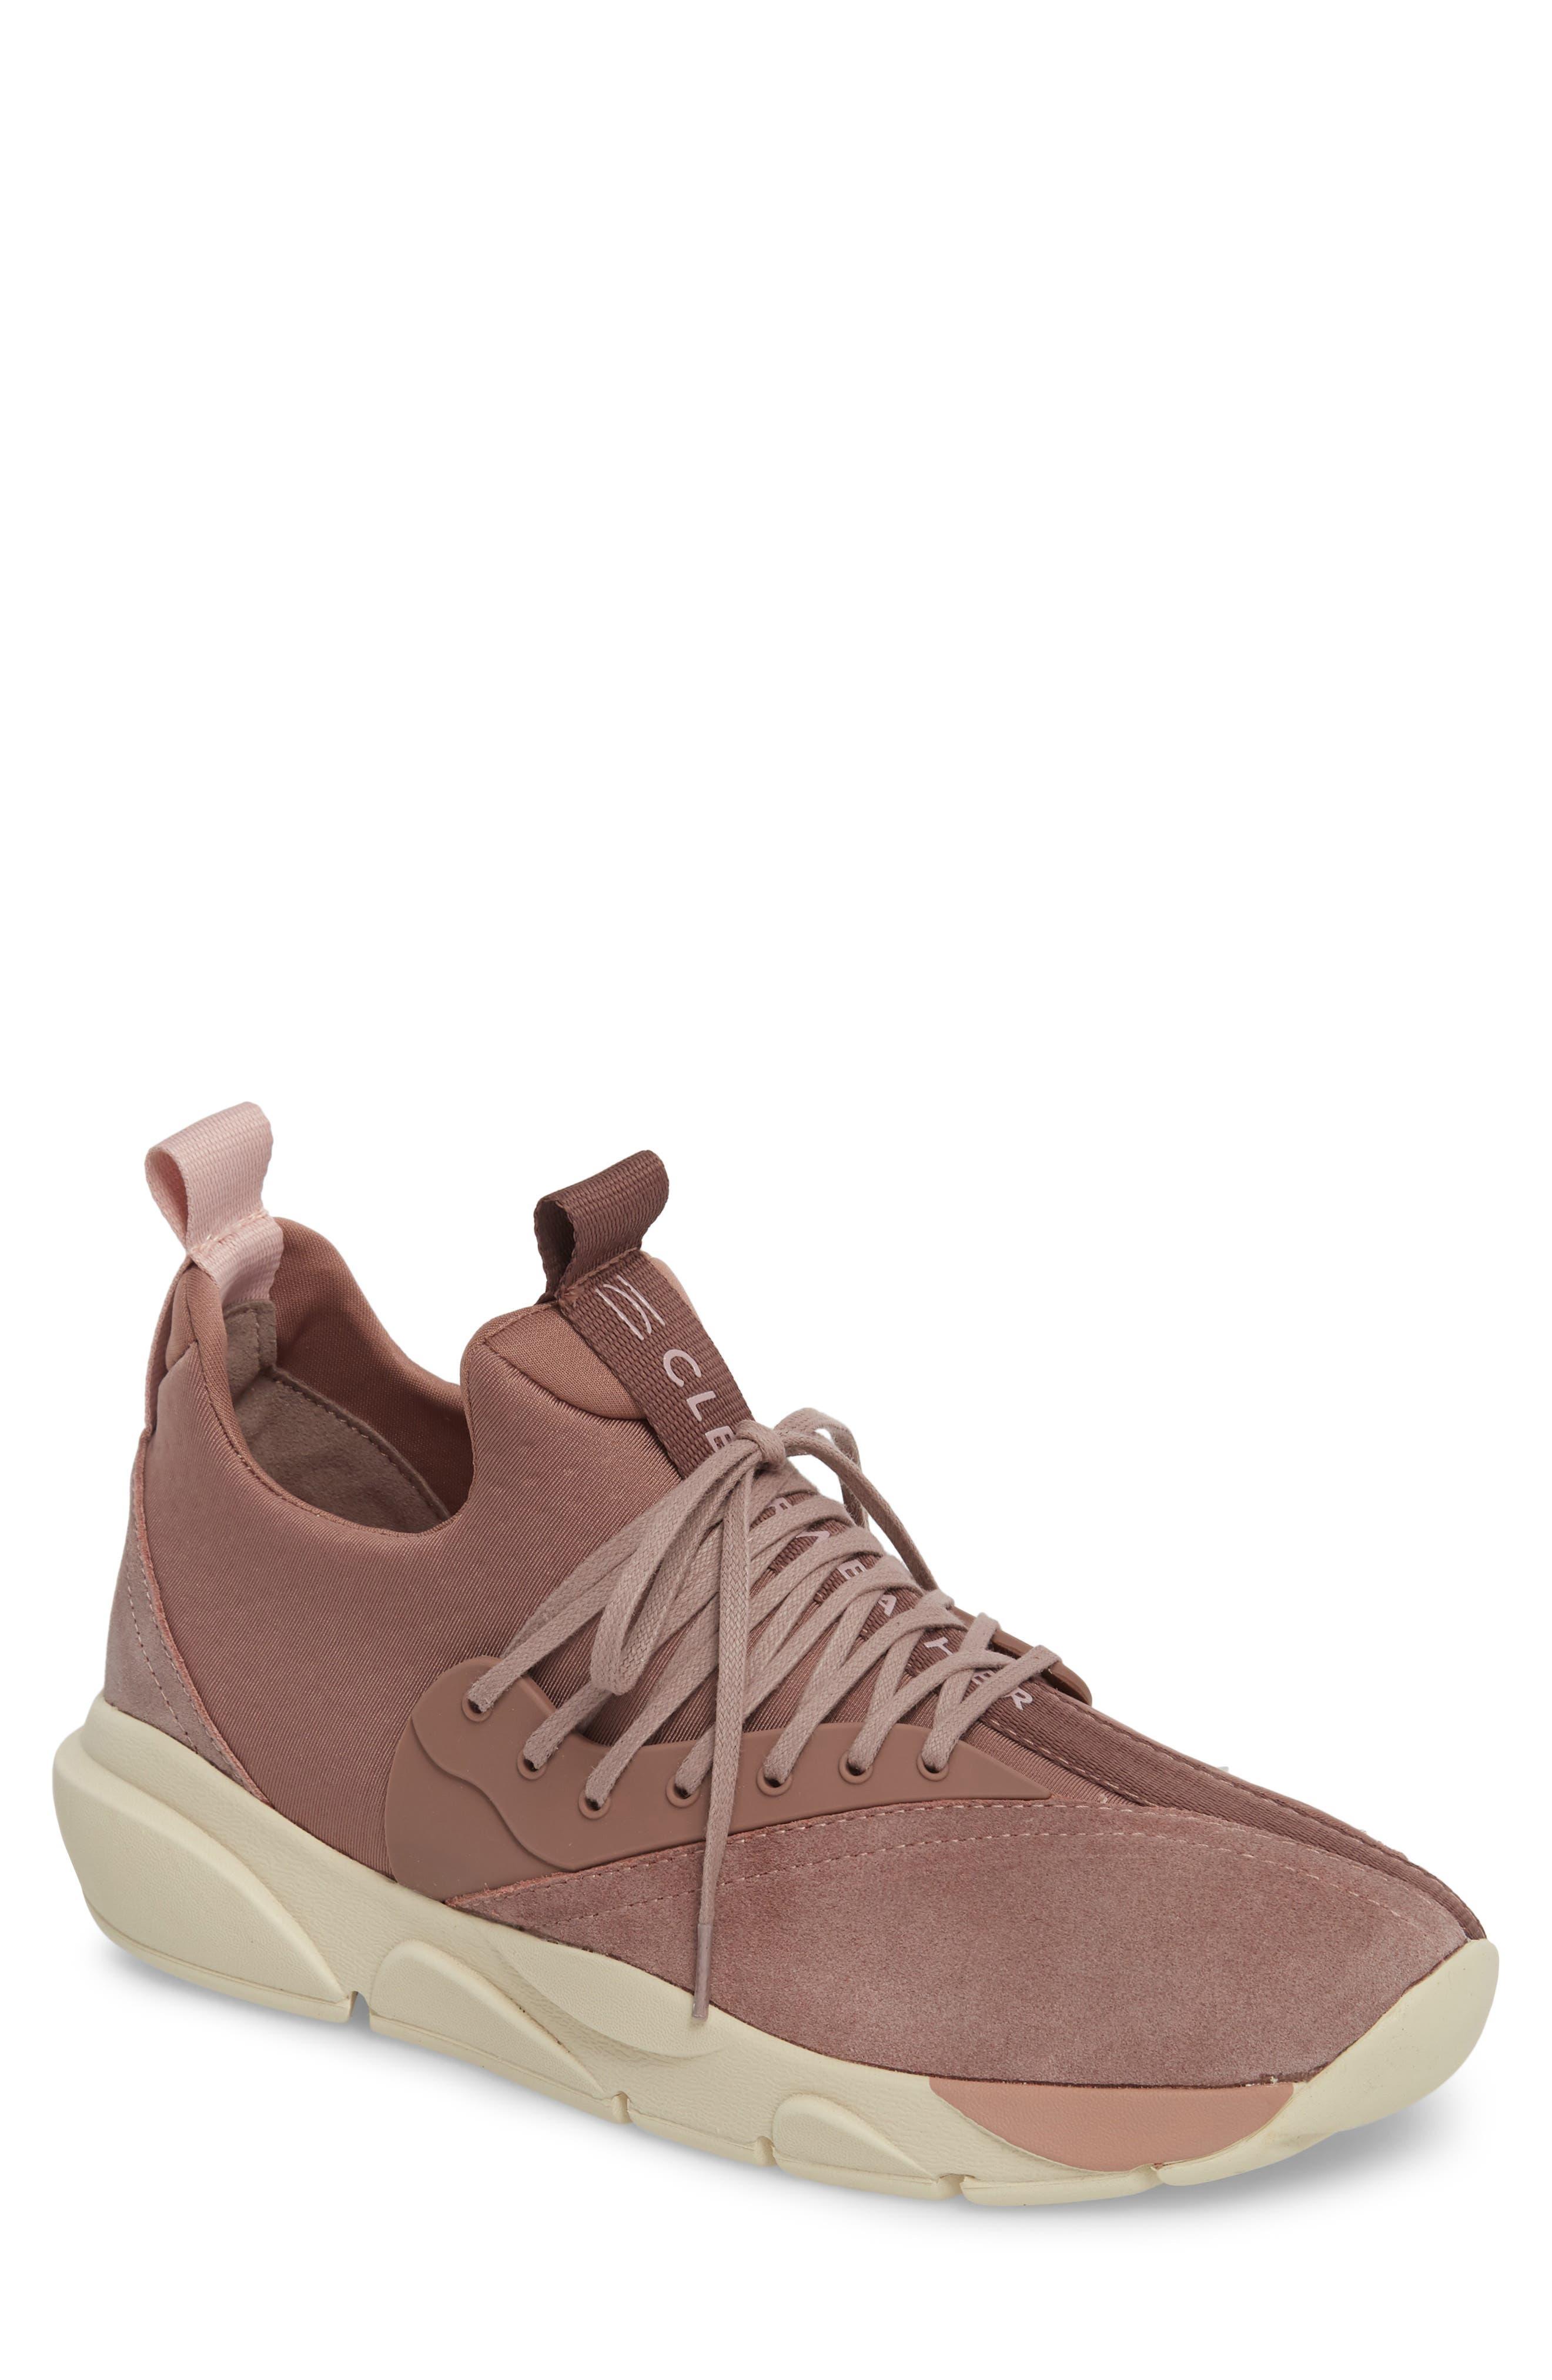 The Cloud Stryke Sneaker,                             Main thumbnail 1, color,                             Antler Pink